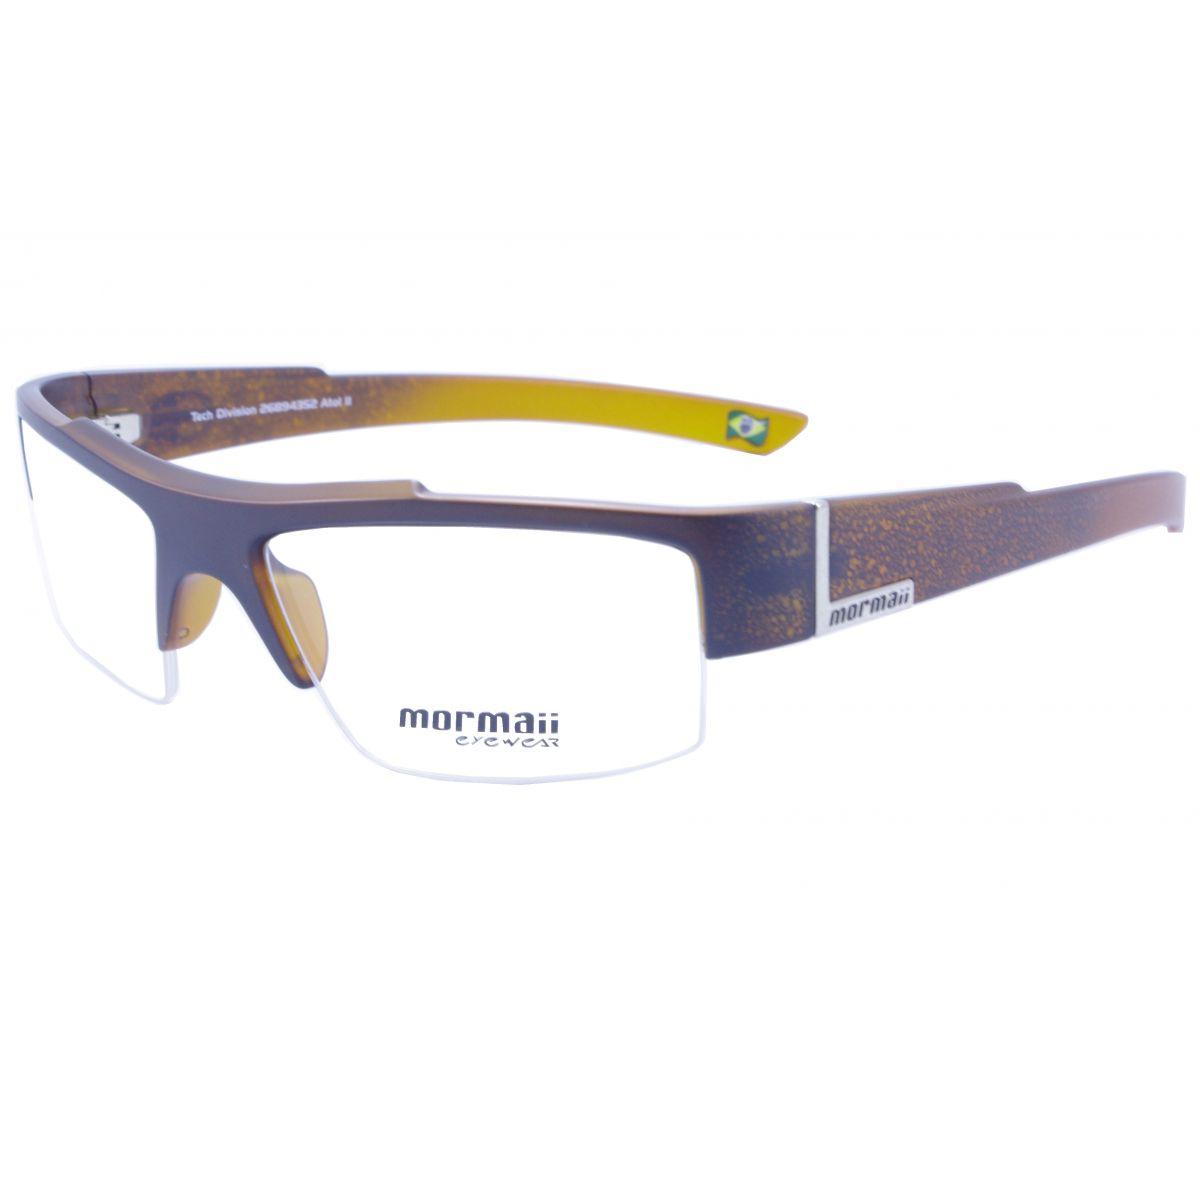 Óculos De Grau Mormaii Atol 2 1268 943 Tam.52MormaiiMormaii de ... 14640c9db4